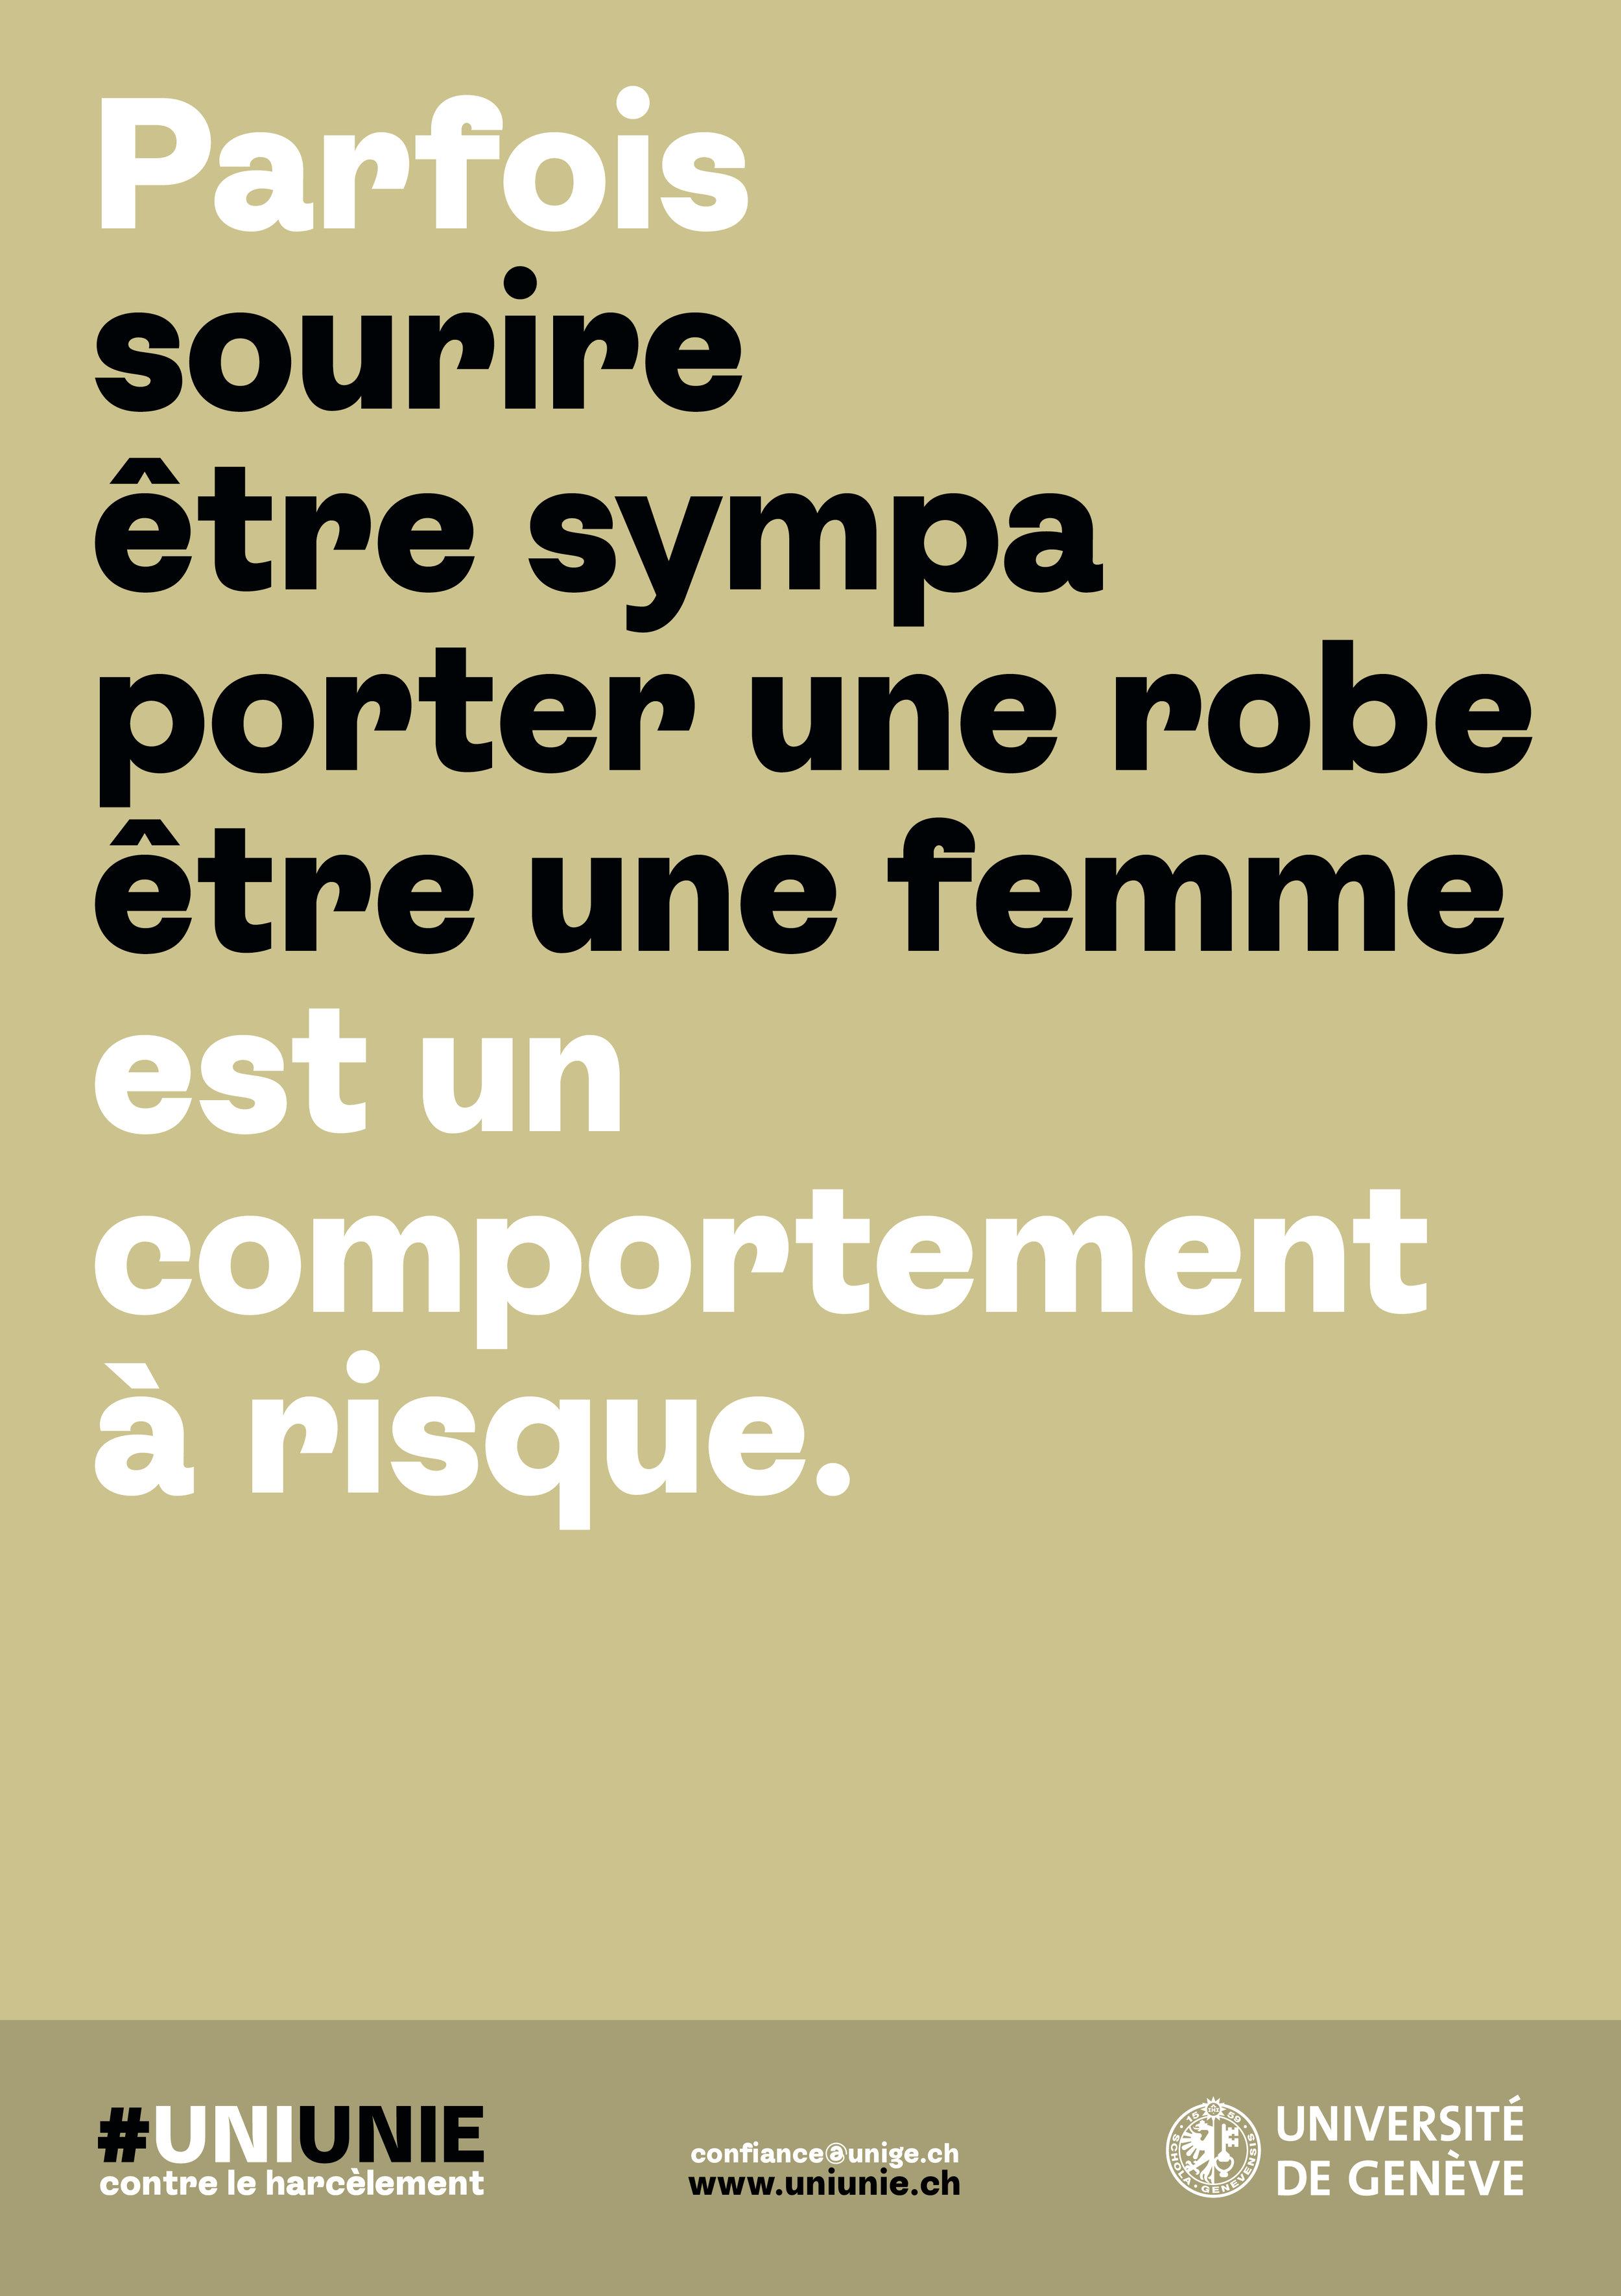 UNIUNIE_affiches12.jpg